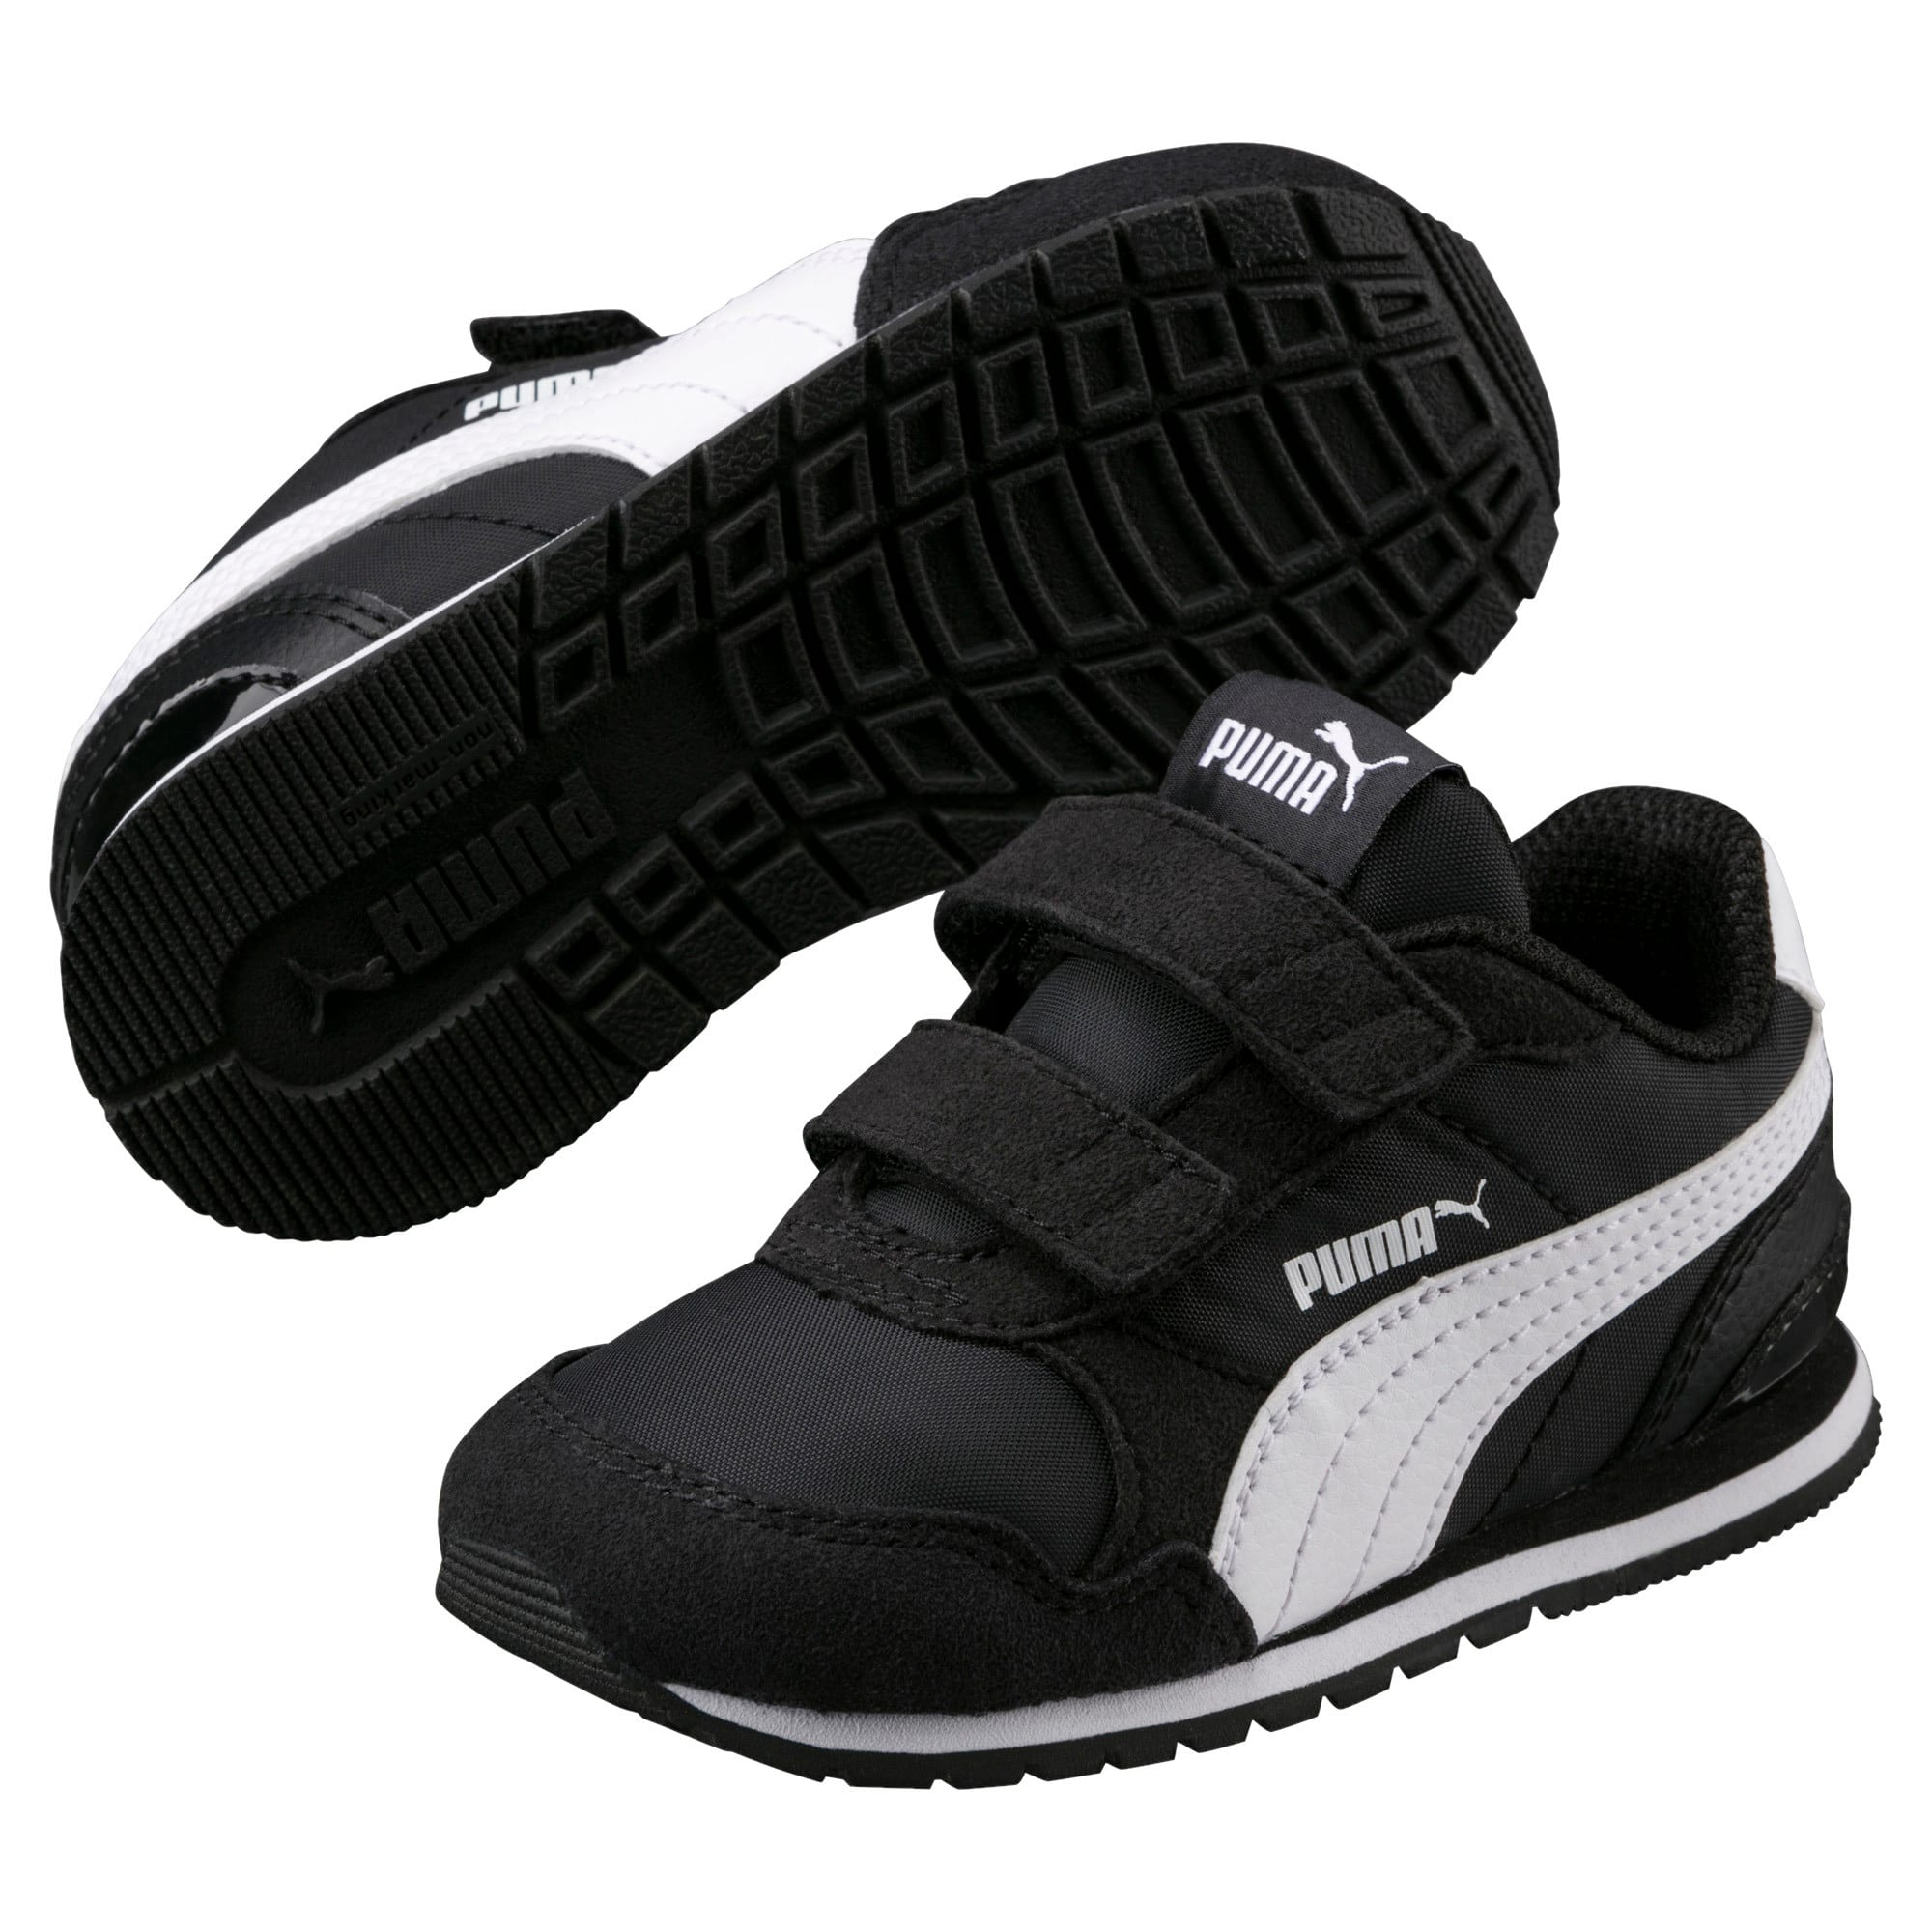 Thumbnail 2 of ST Runner V2 V Toddler Shoes, Puma Black-Puma White, medium